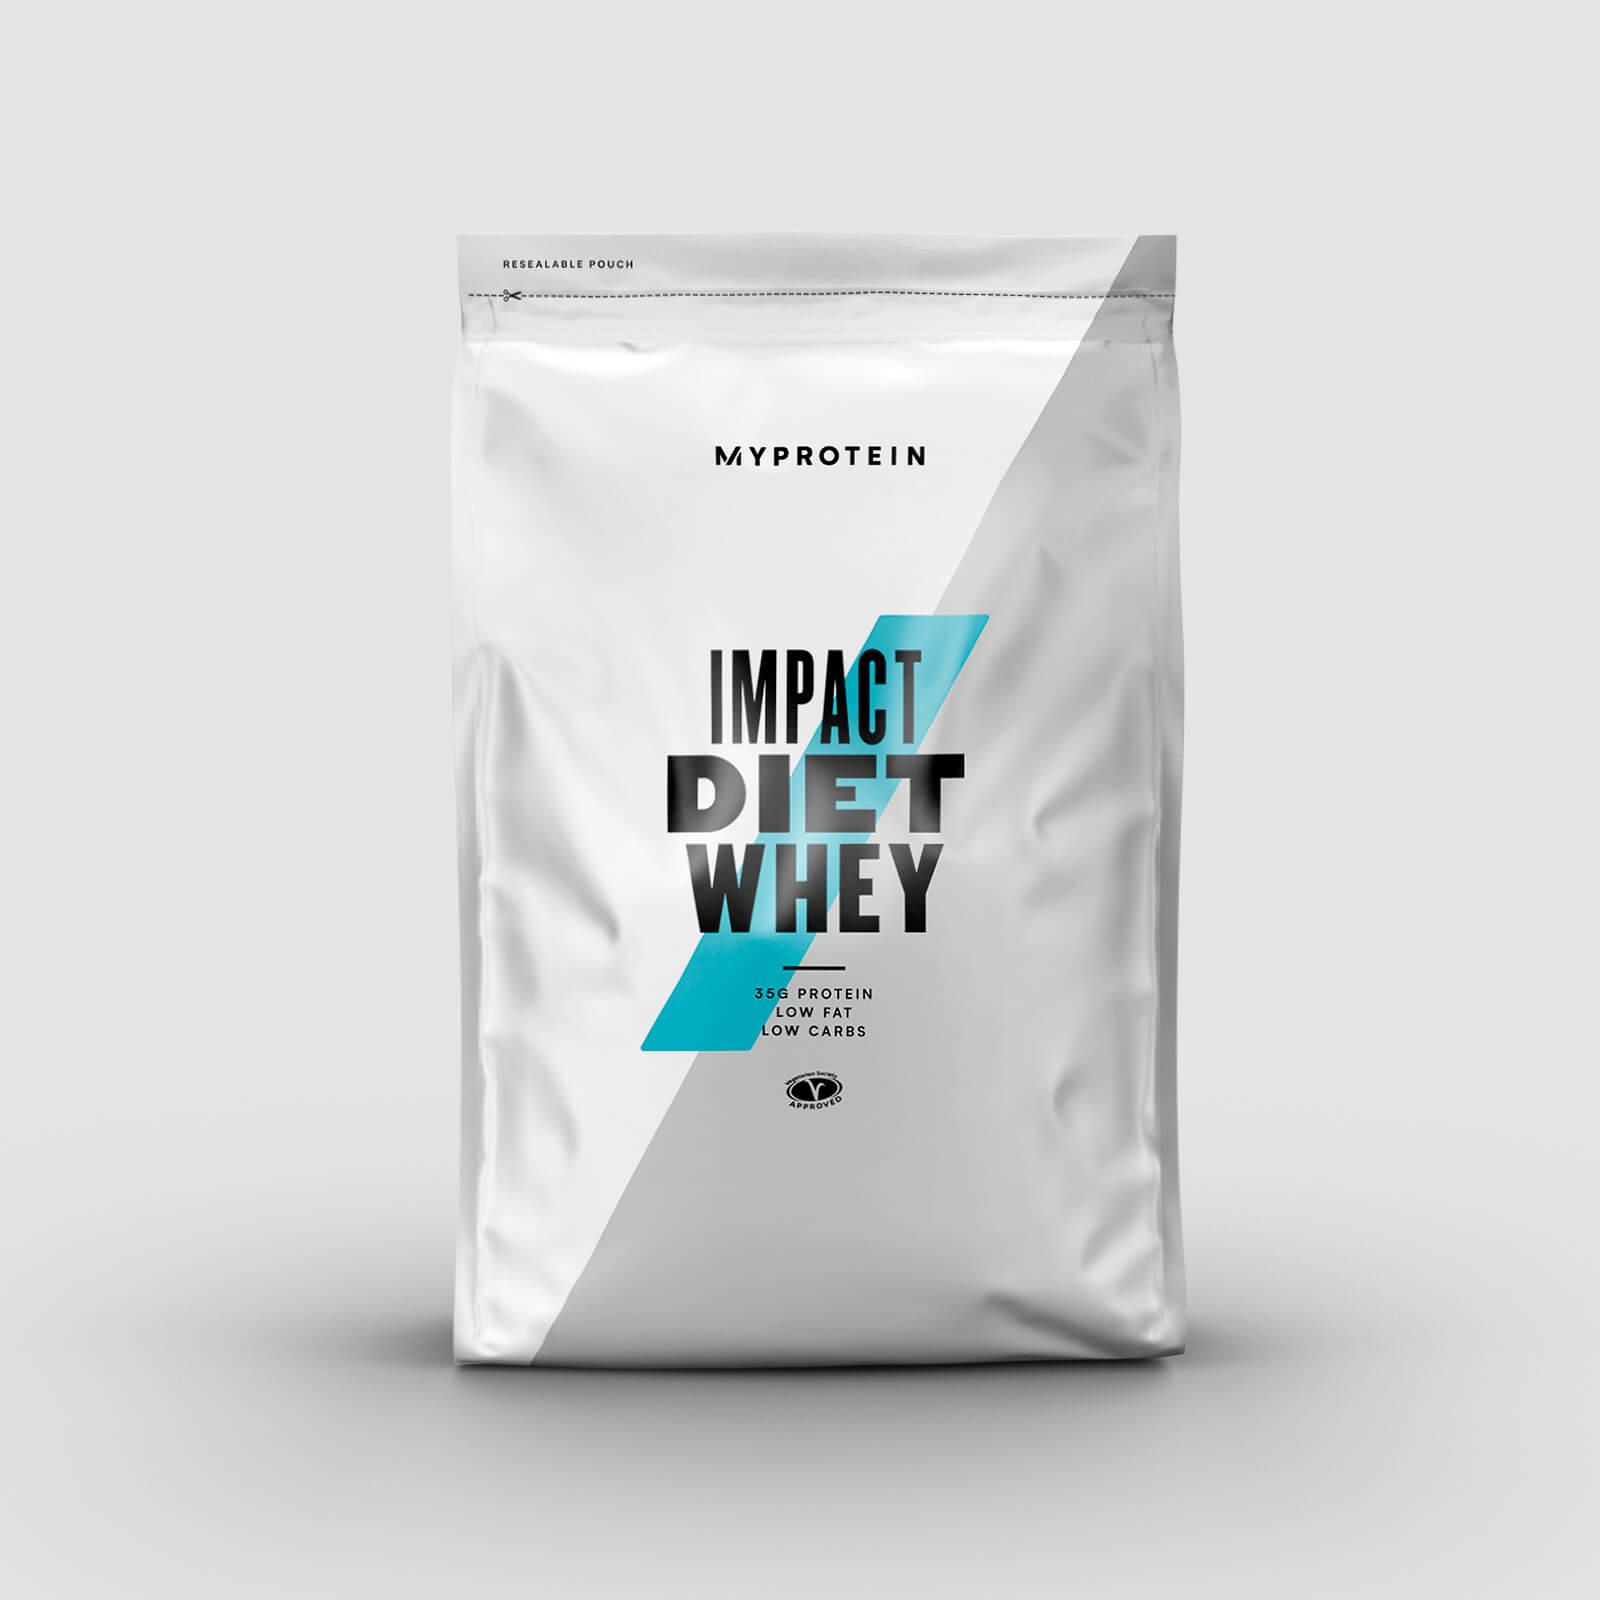 MyProtein Impact Diet Whey Příchuť: Cookies se smetanou, Hmotnost: 2500g